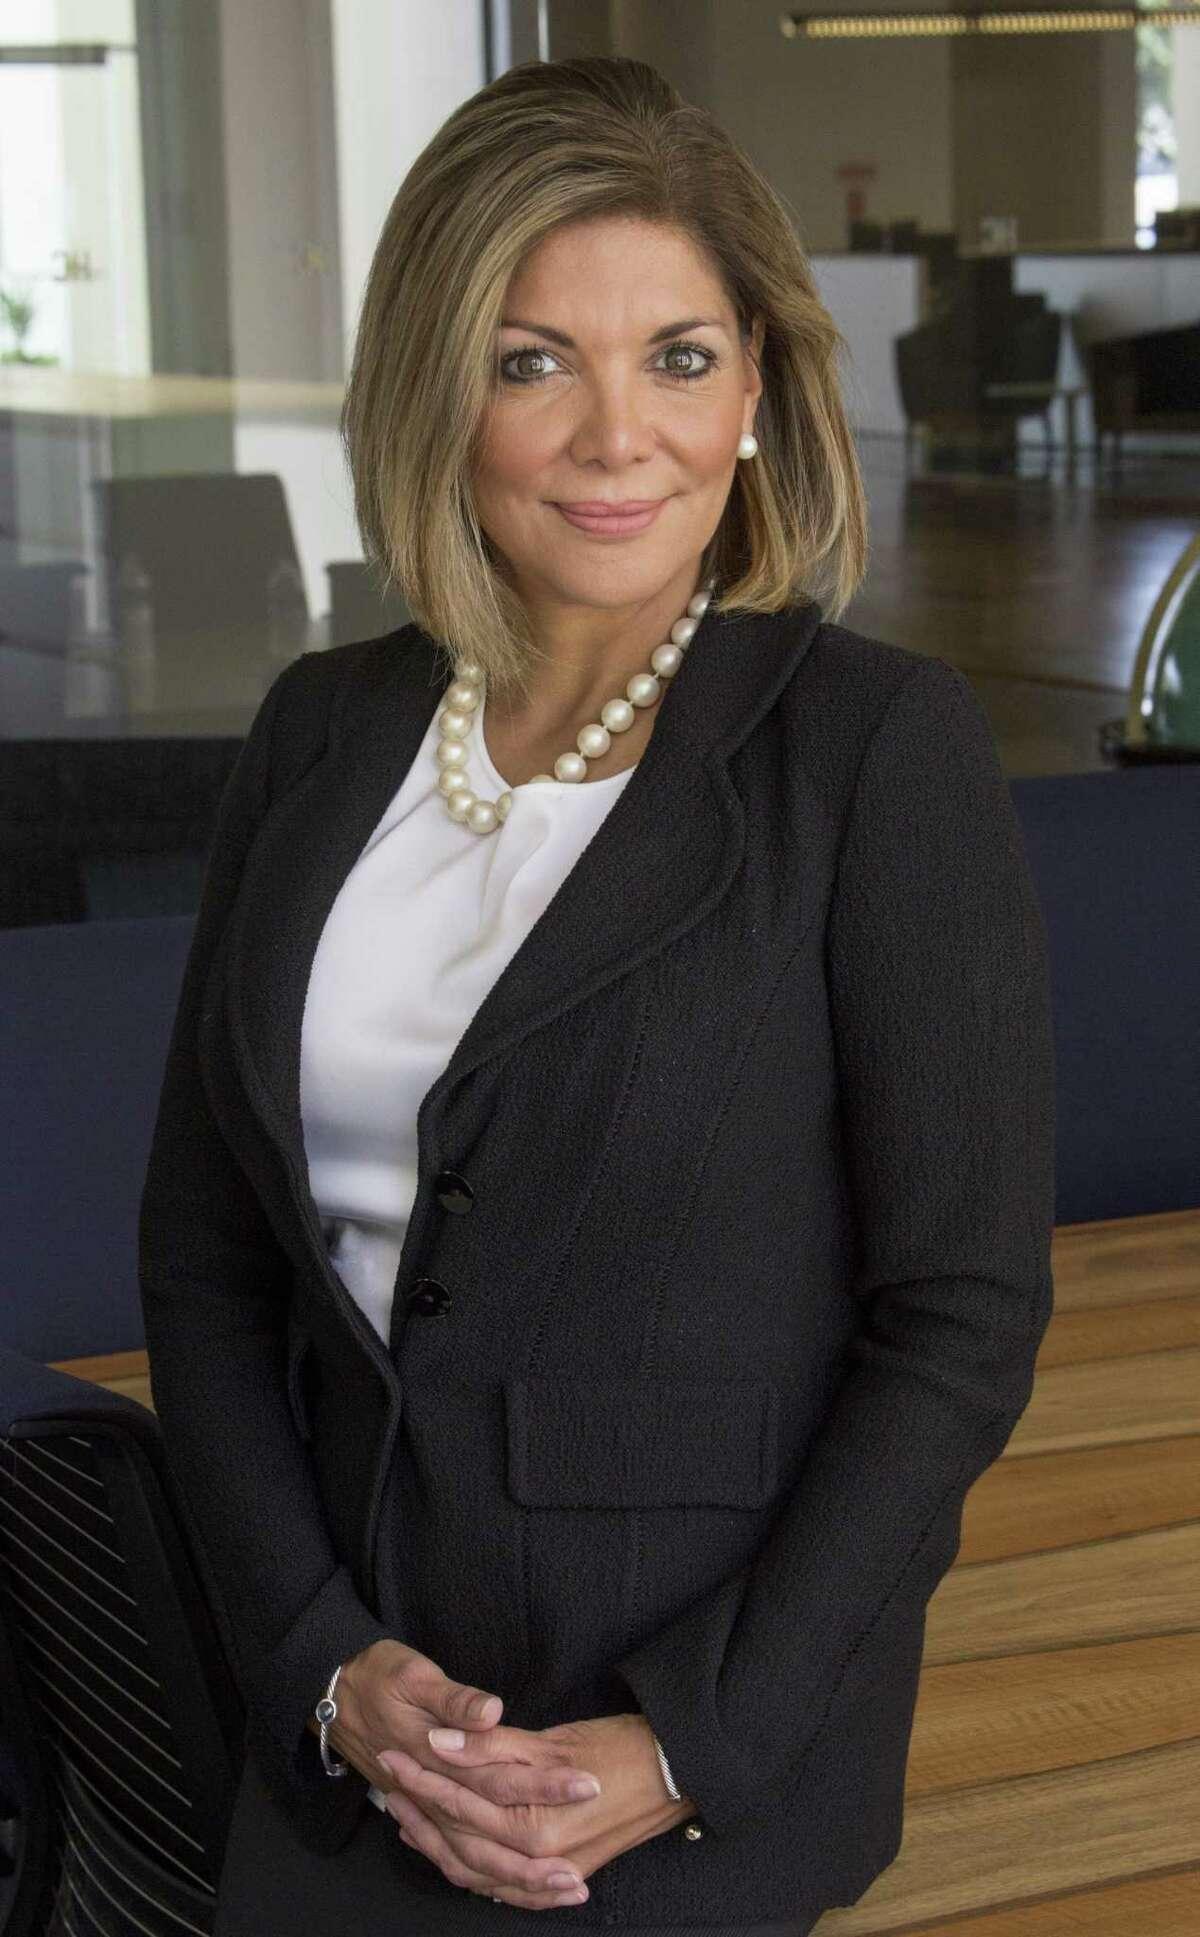 former Texas Supreme Court Justice Eva Guzman